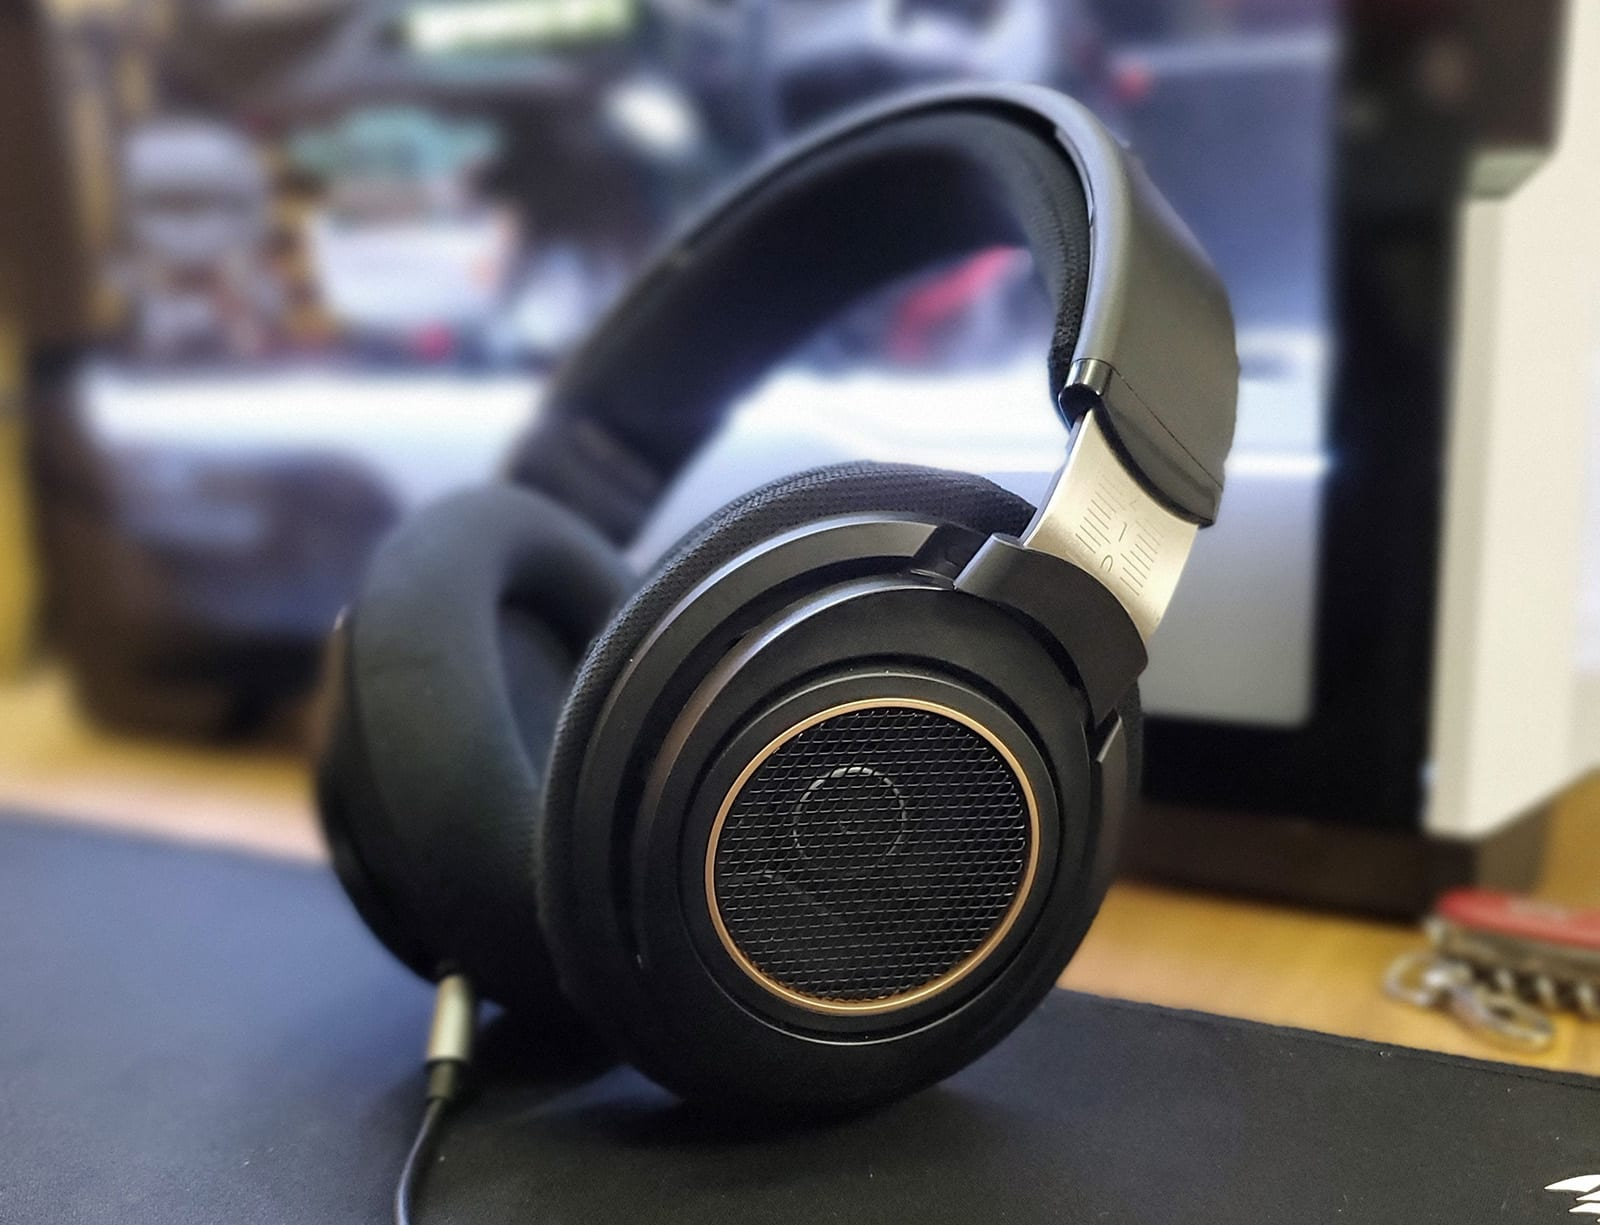 Philips SHP9600 audiophile headphones